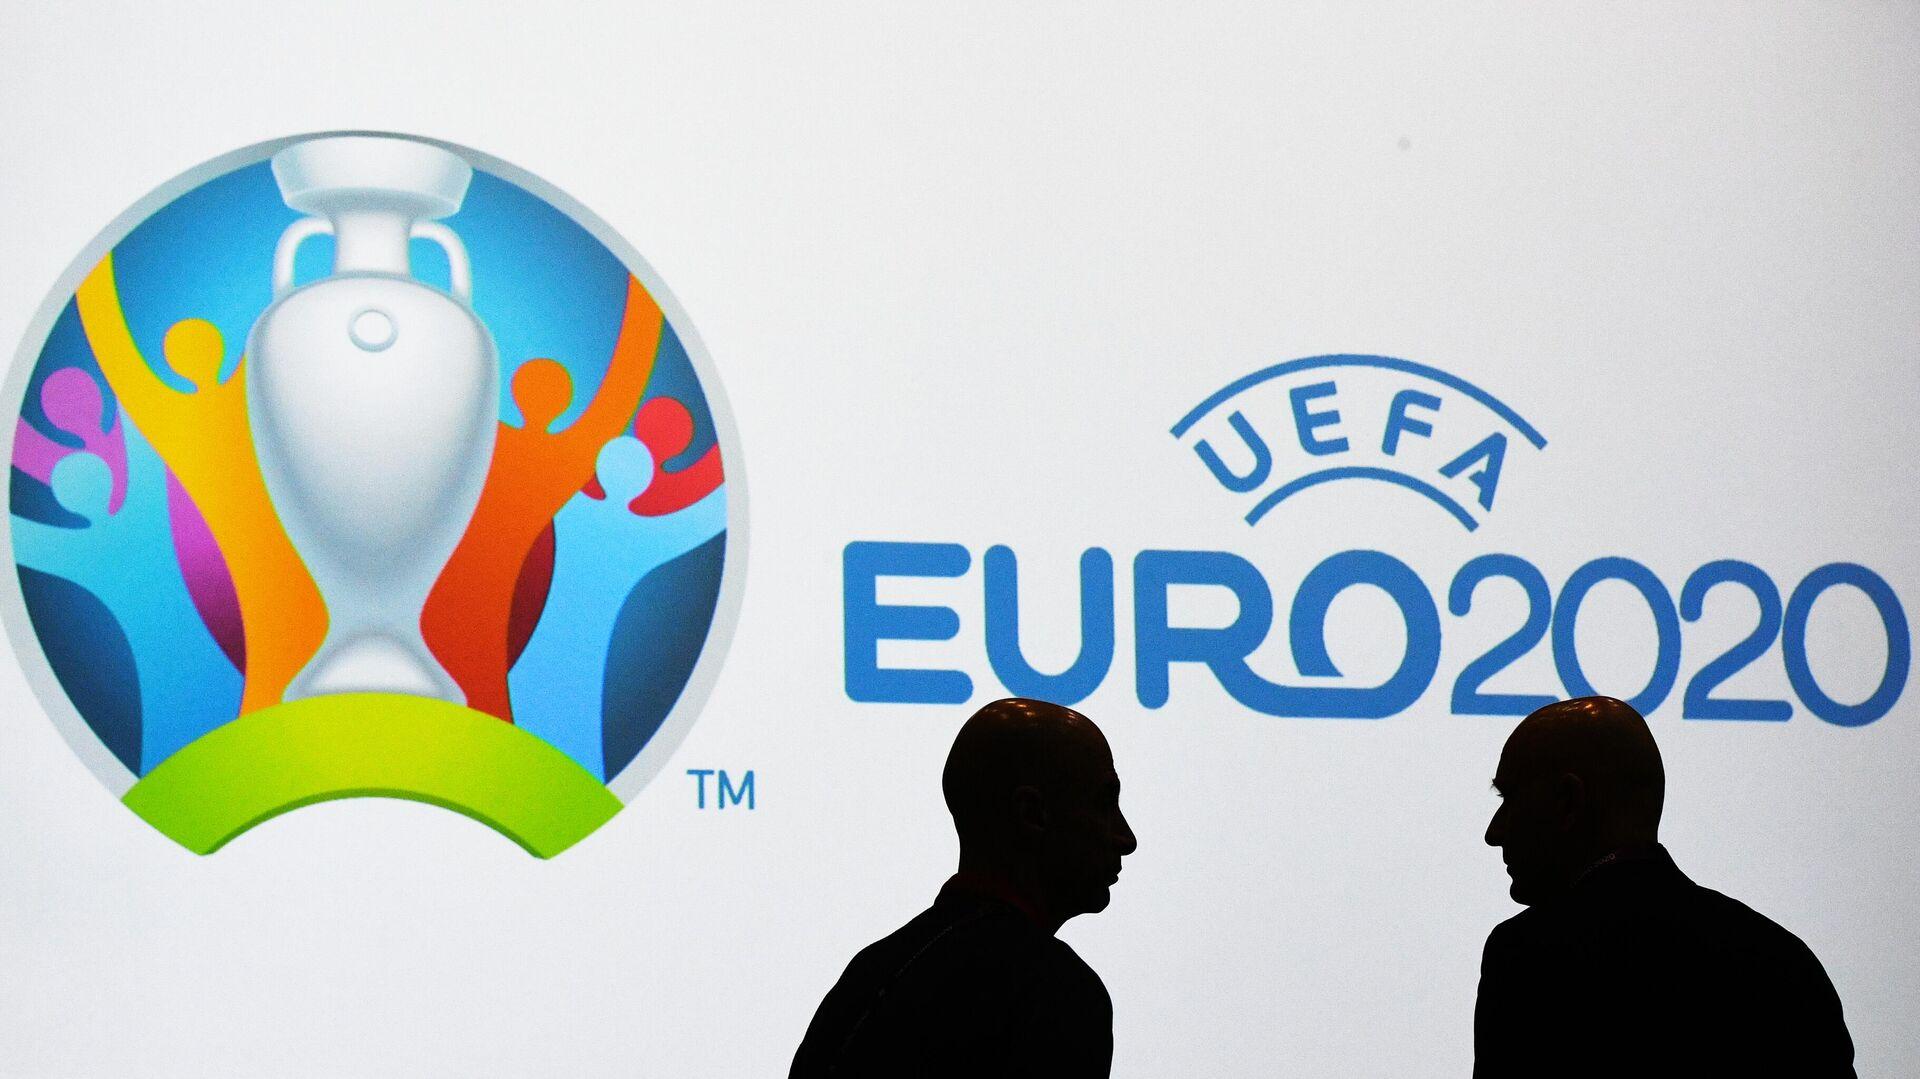 Логотип ЕВРО-2020 - РИА Новости, 1920, 07.04.2021